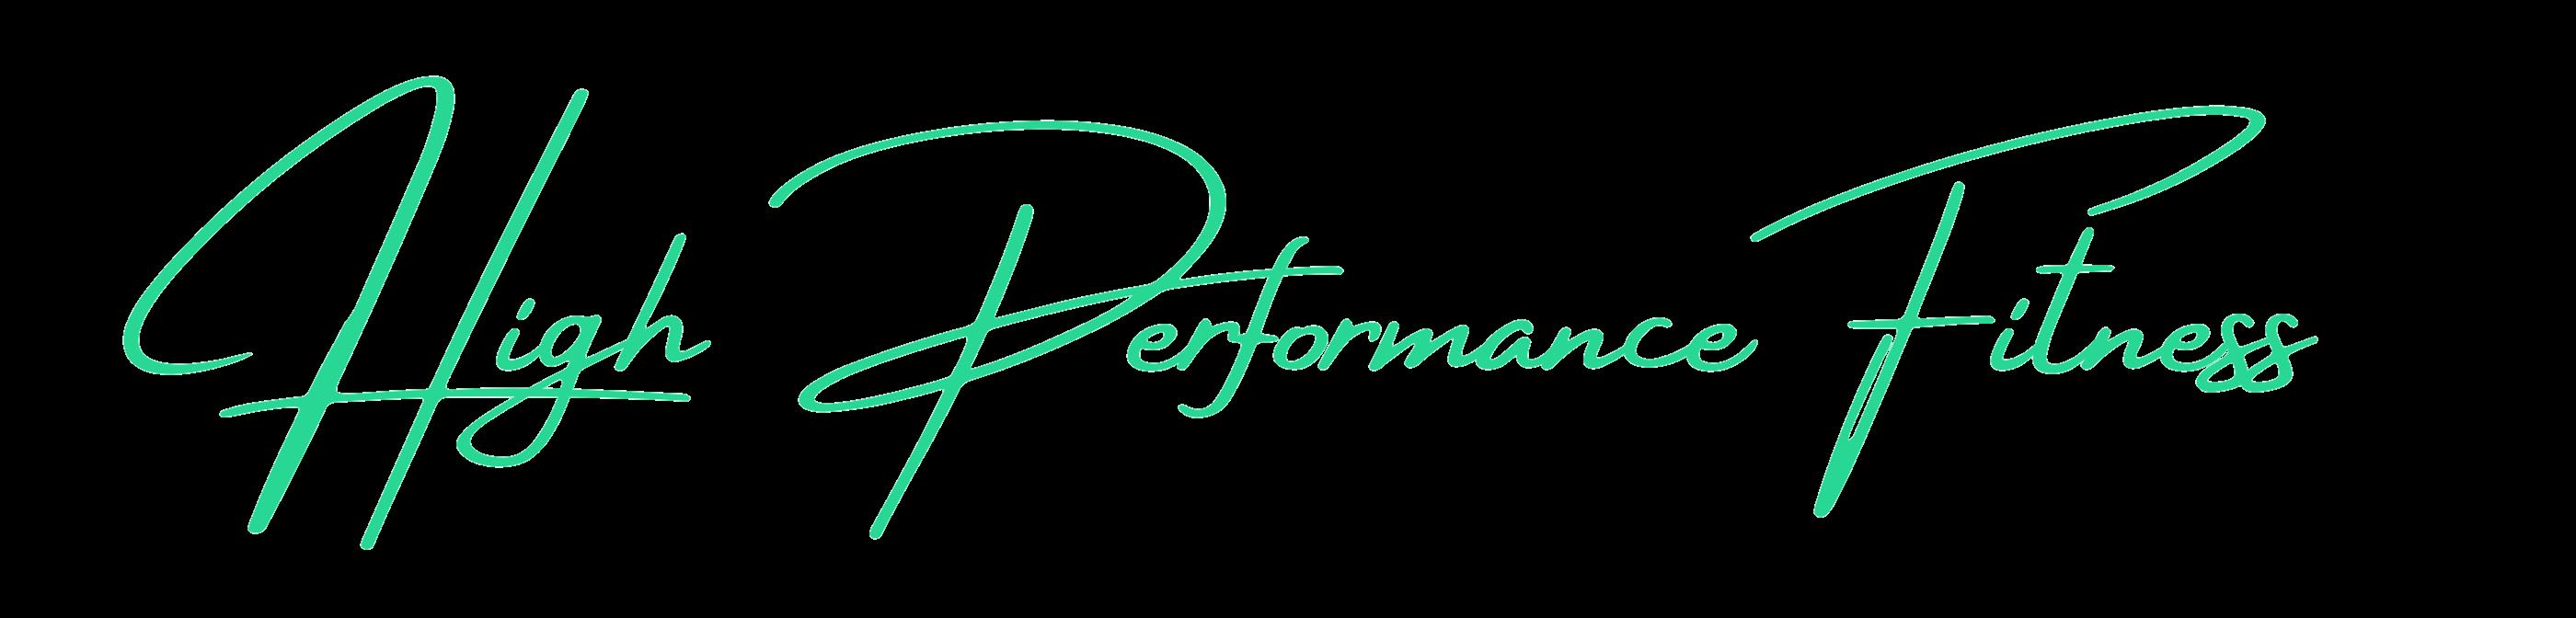 High Performance Fitness, Fitnessprogramm